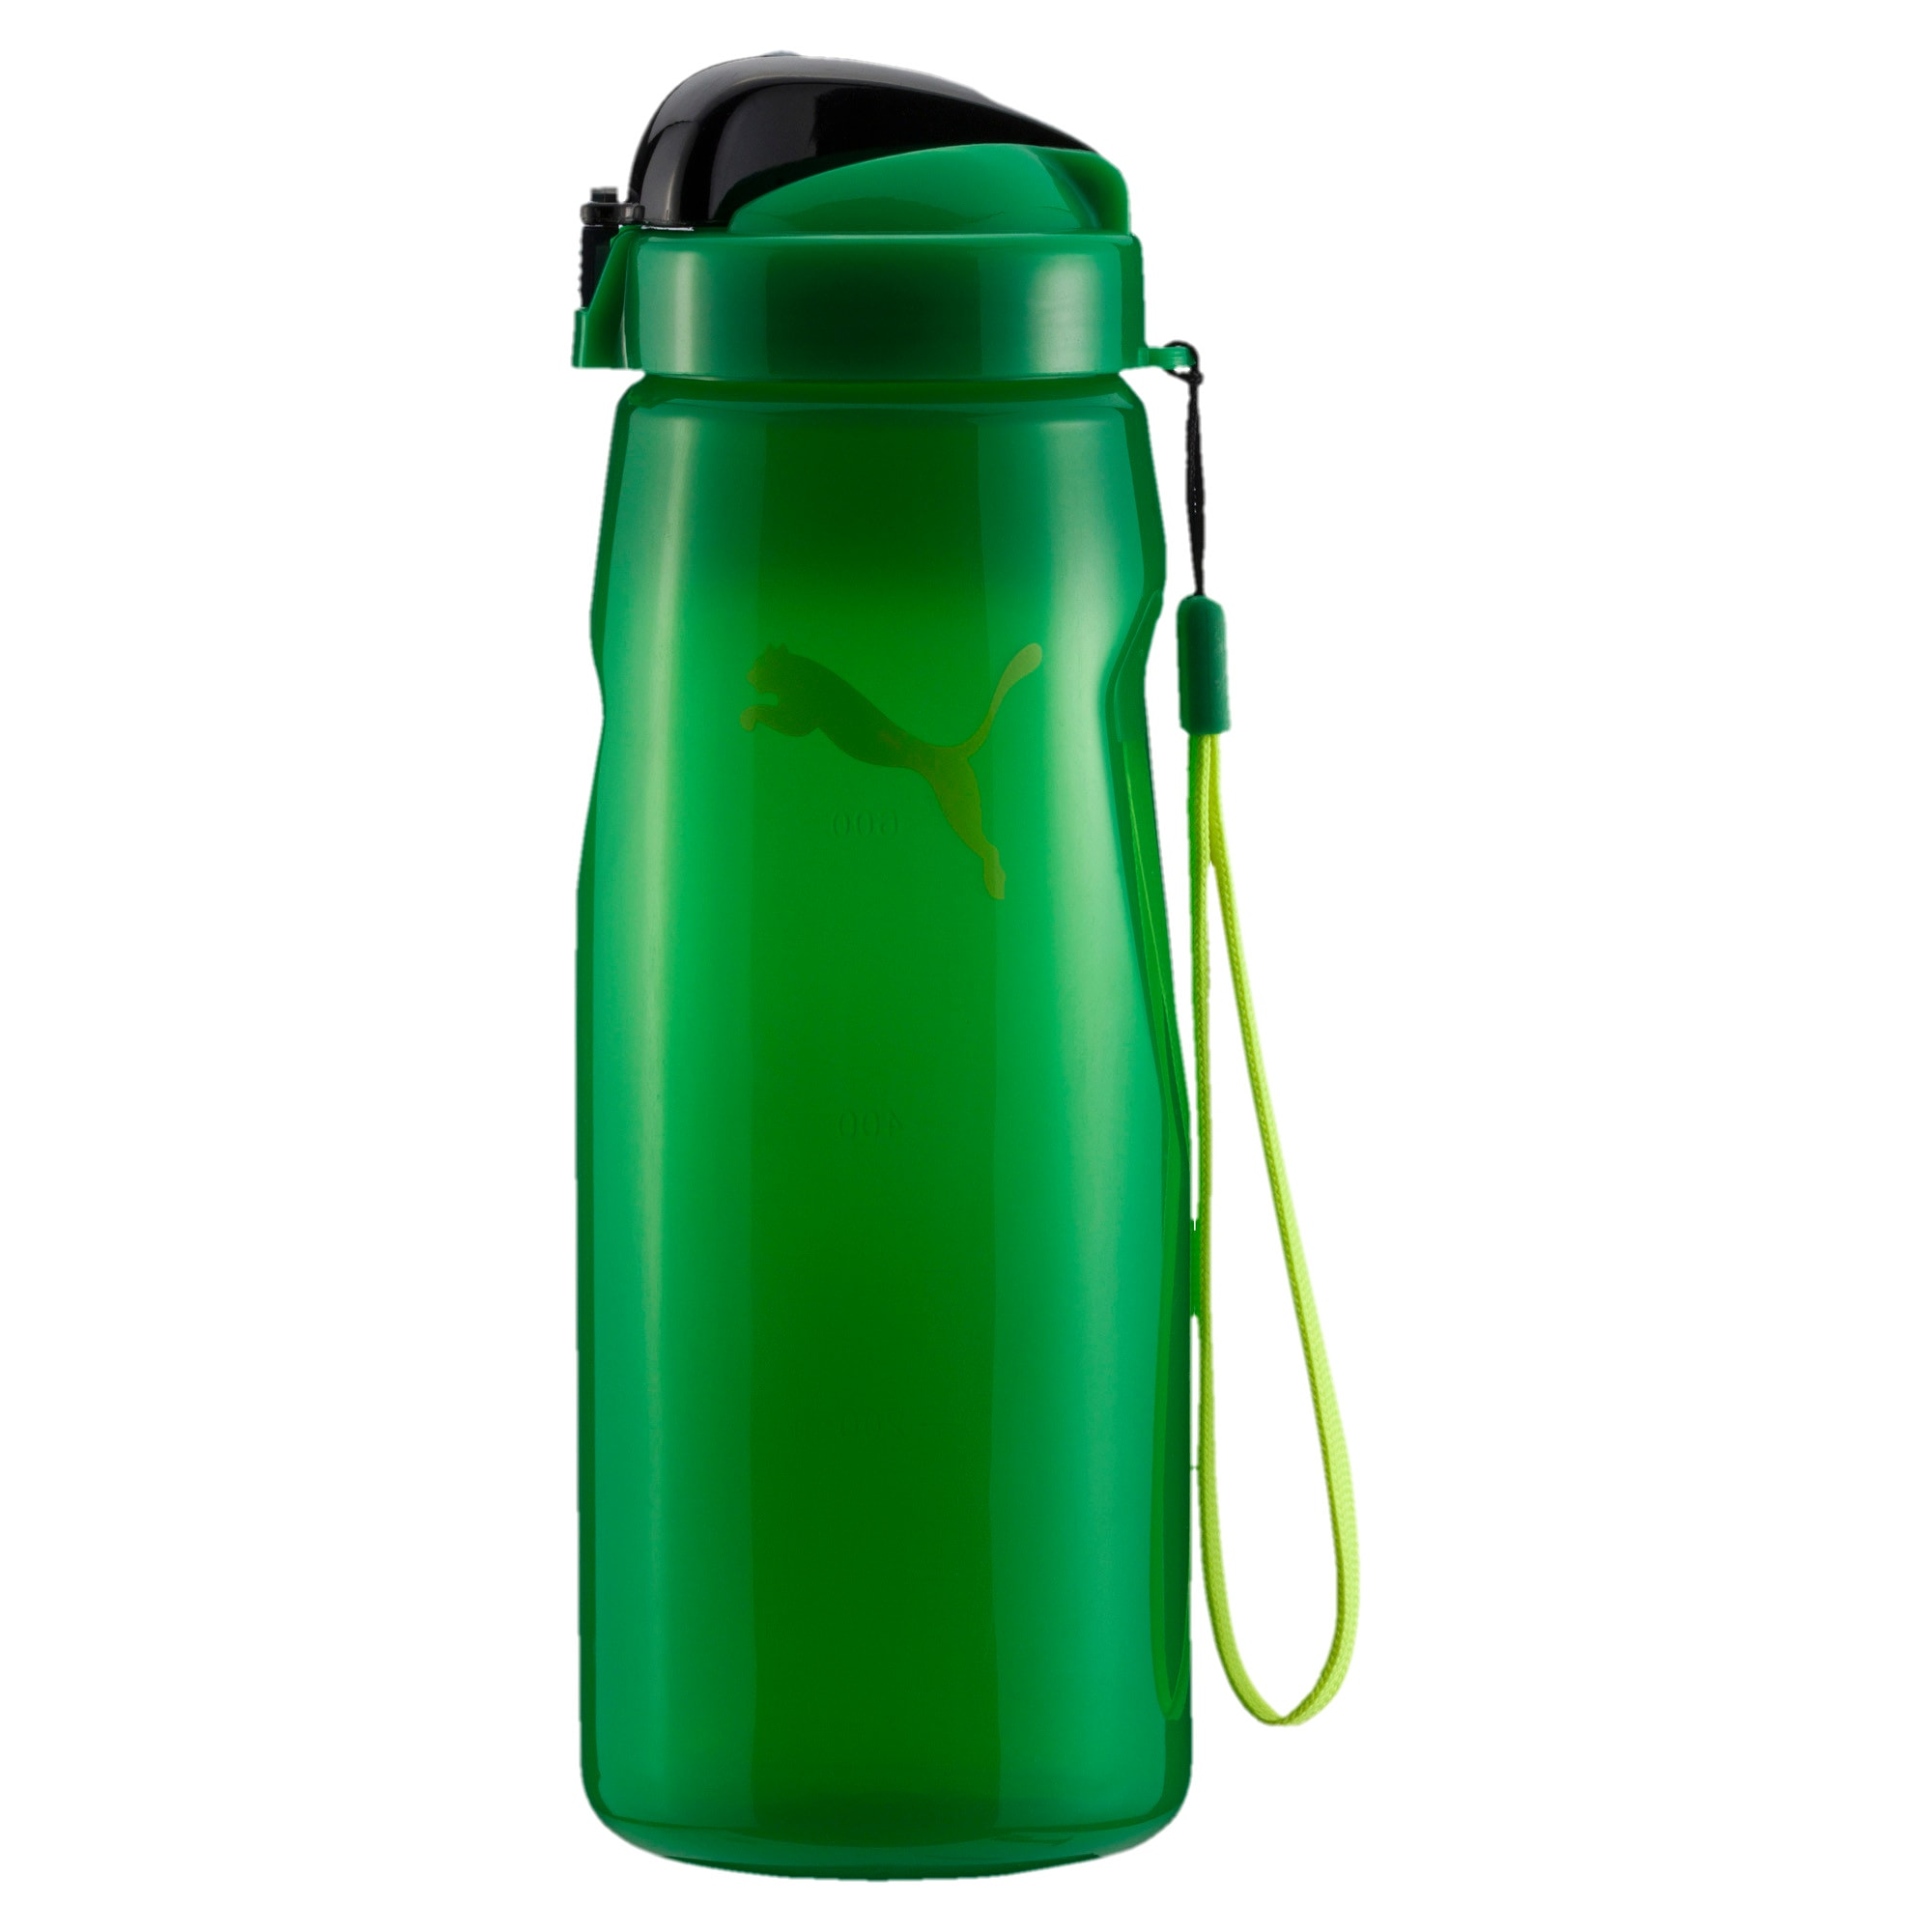 Thumbnail 1 of PUMA Lifestyle Water Bottle, Bright Green, medium-IND